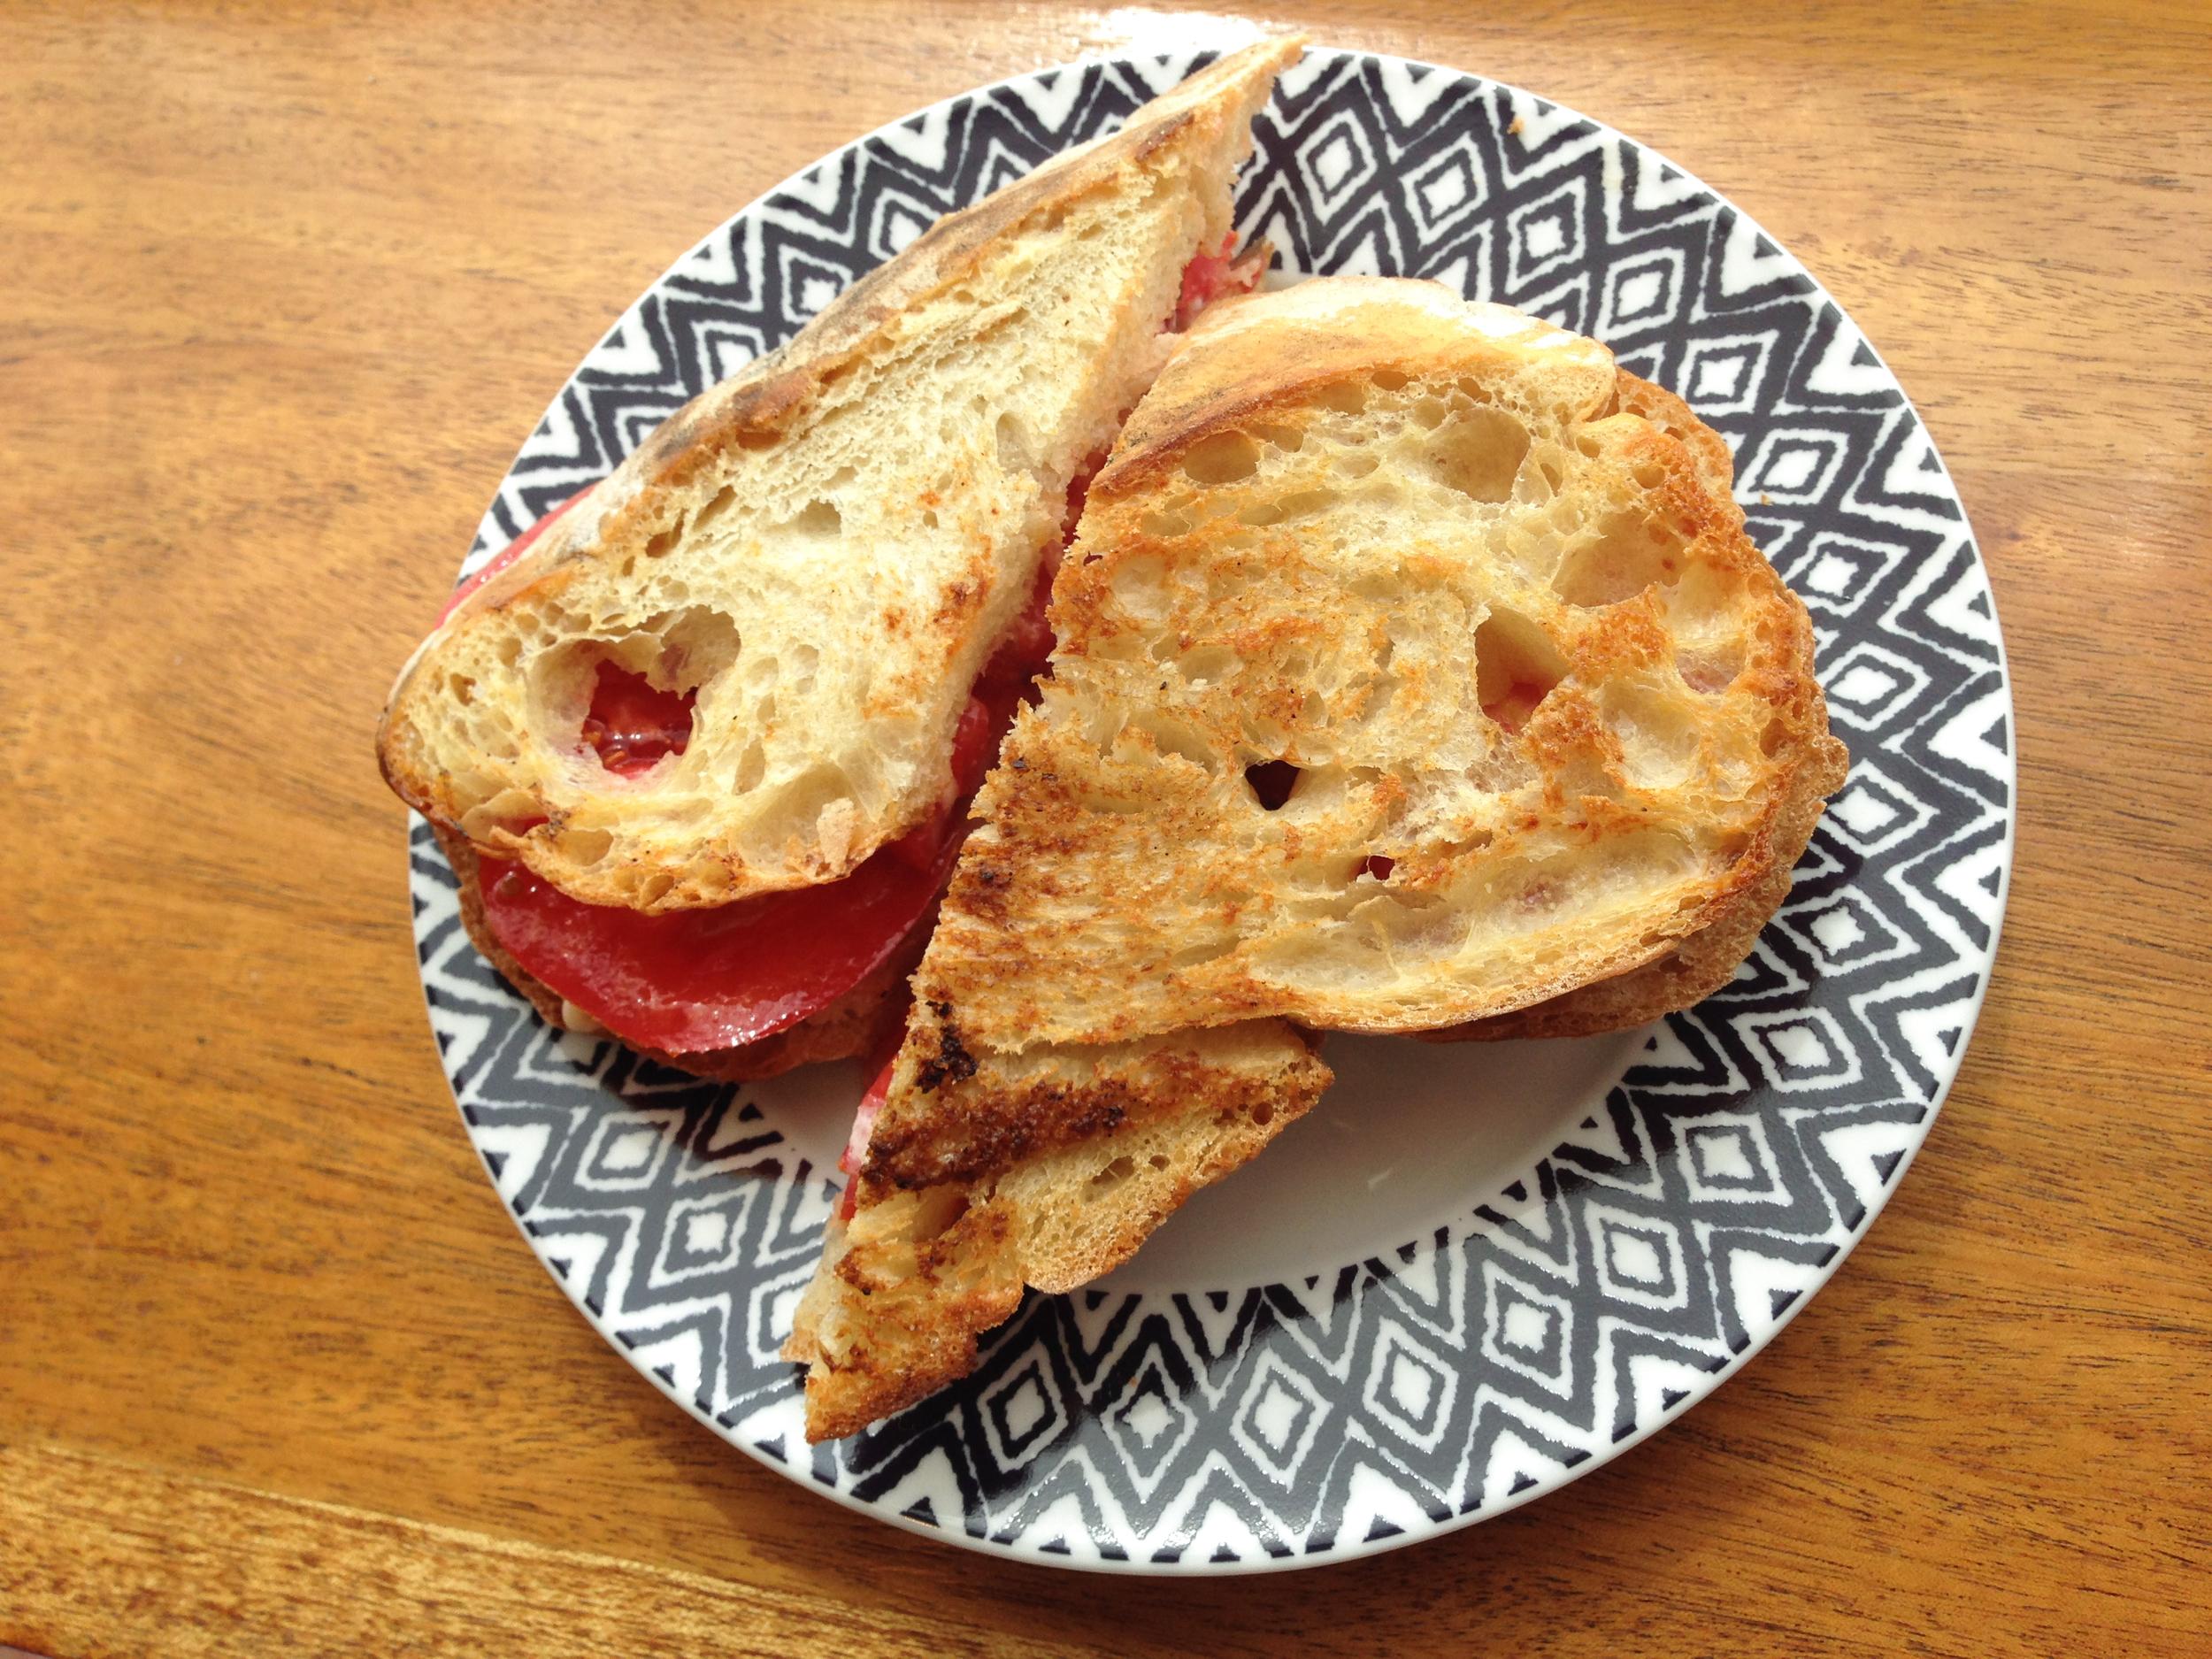 Sandwich at Bonfiglio & Bread | Photo Credit: Find. Eat. Drink.